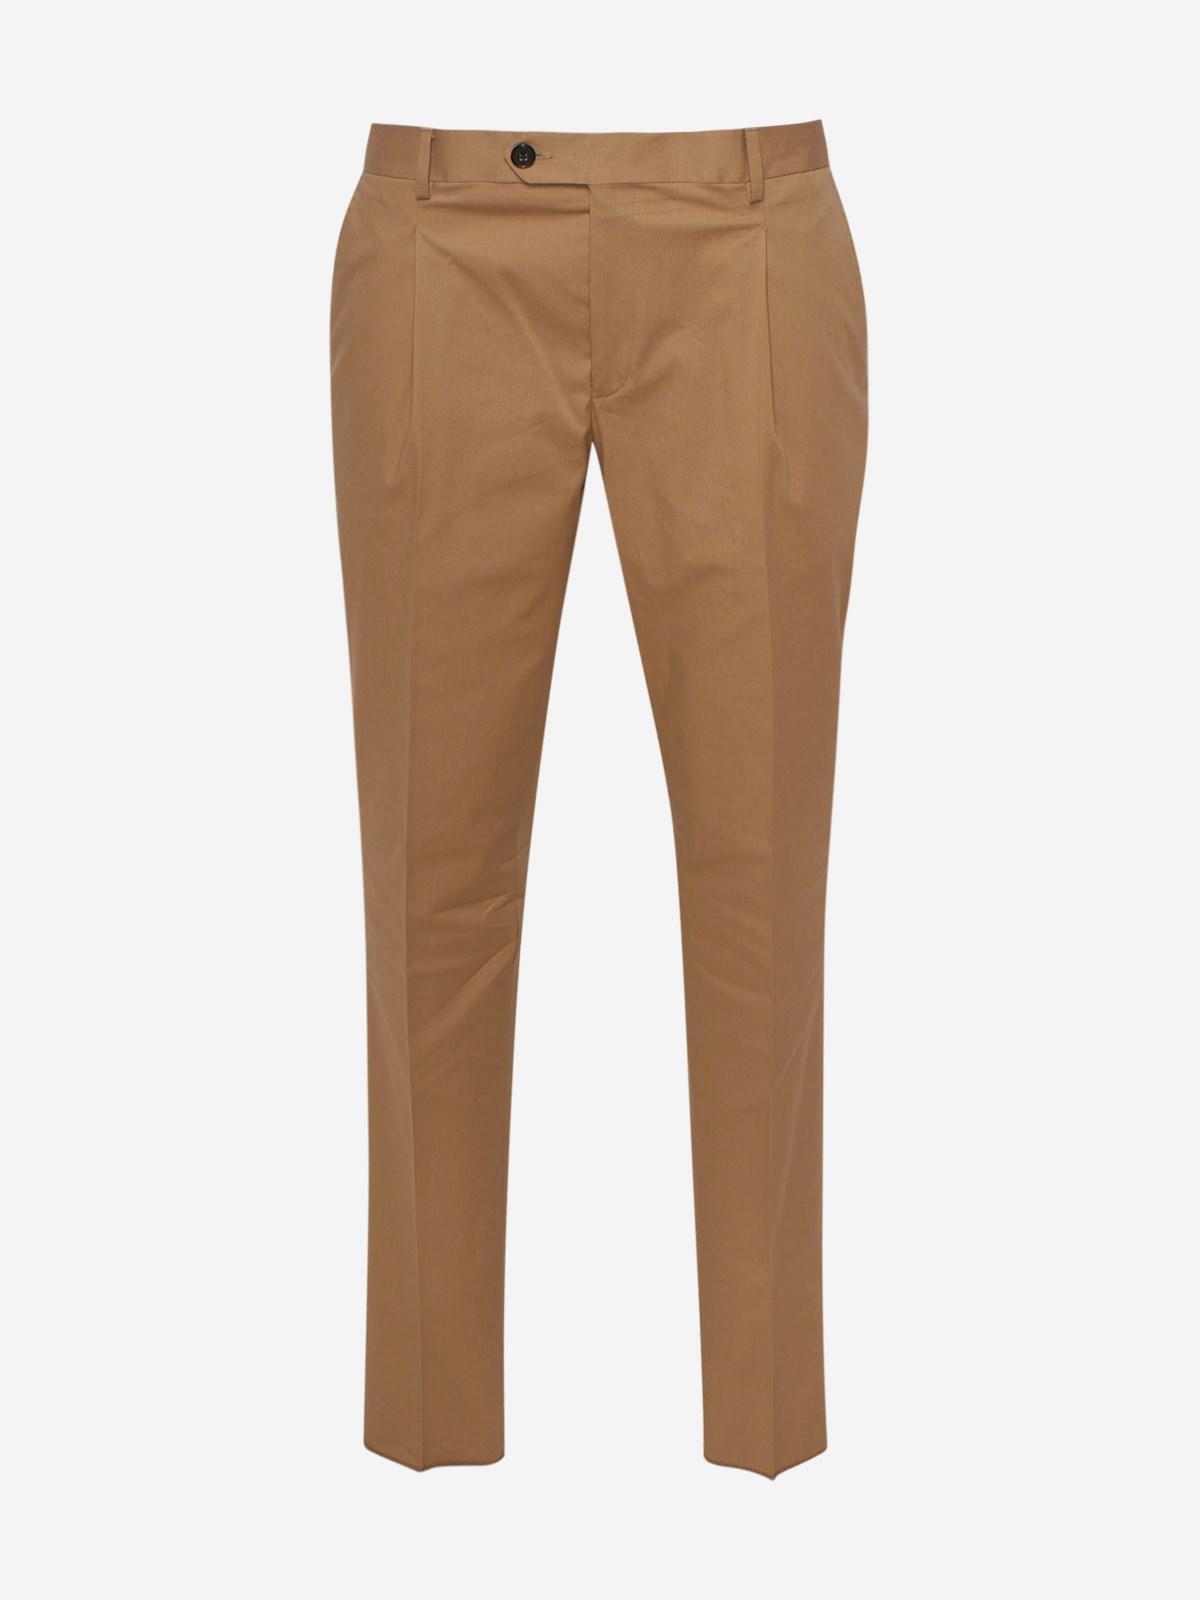 Brian Dales Pants BEIGE PANTS